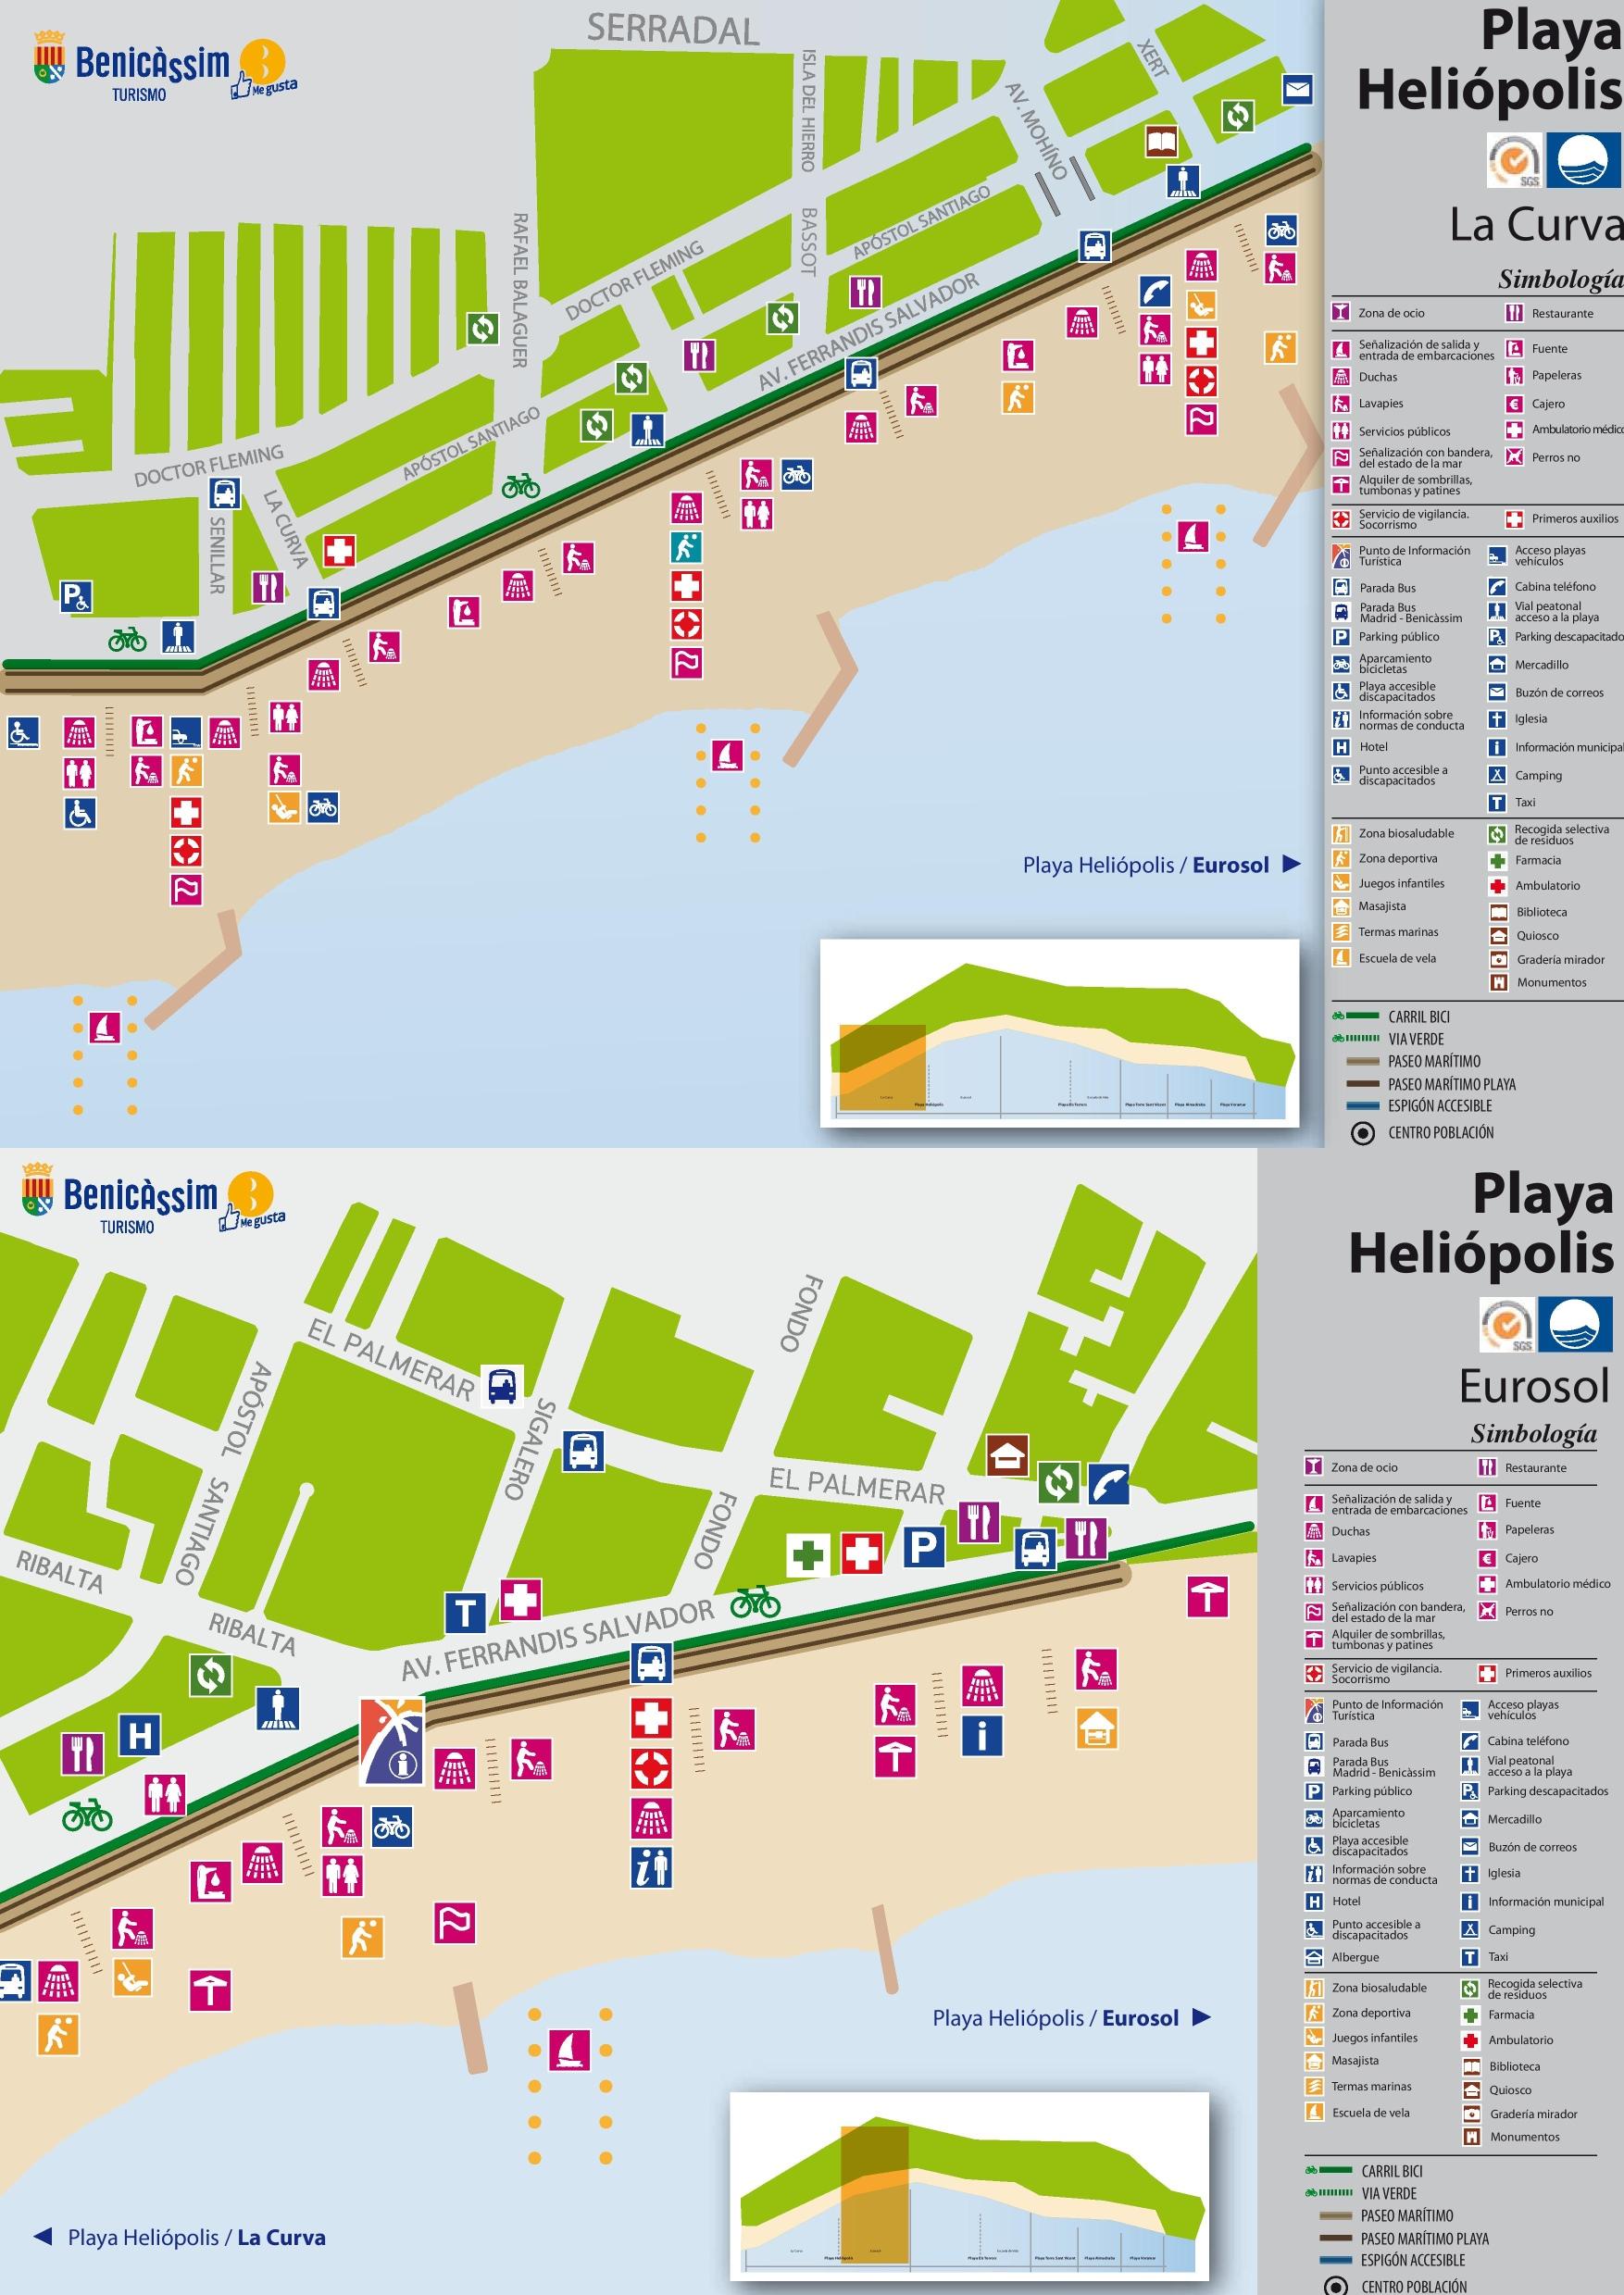 Playa Heliopolis map